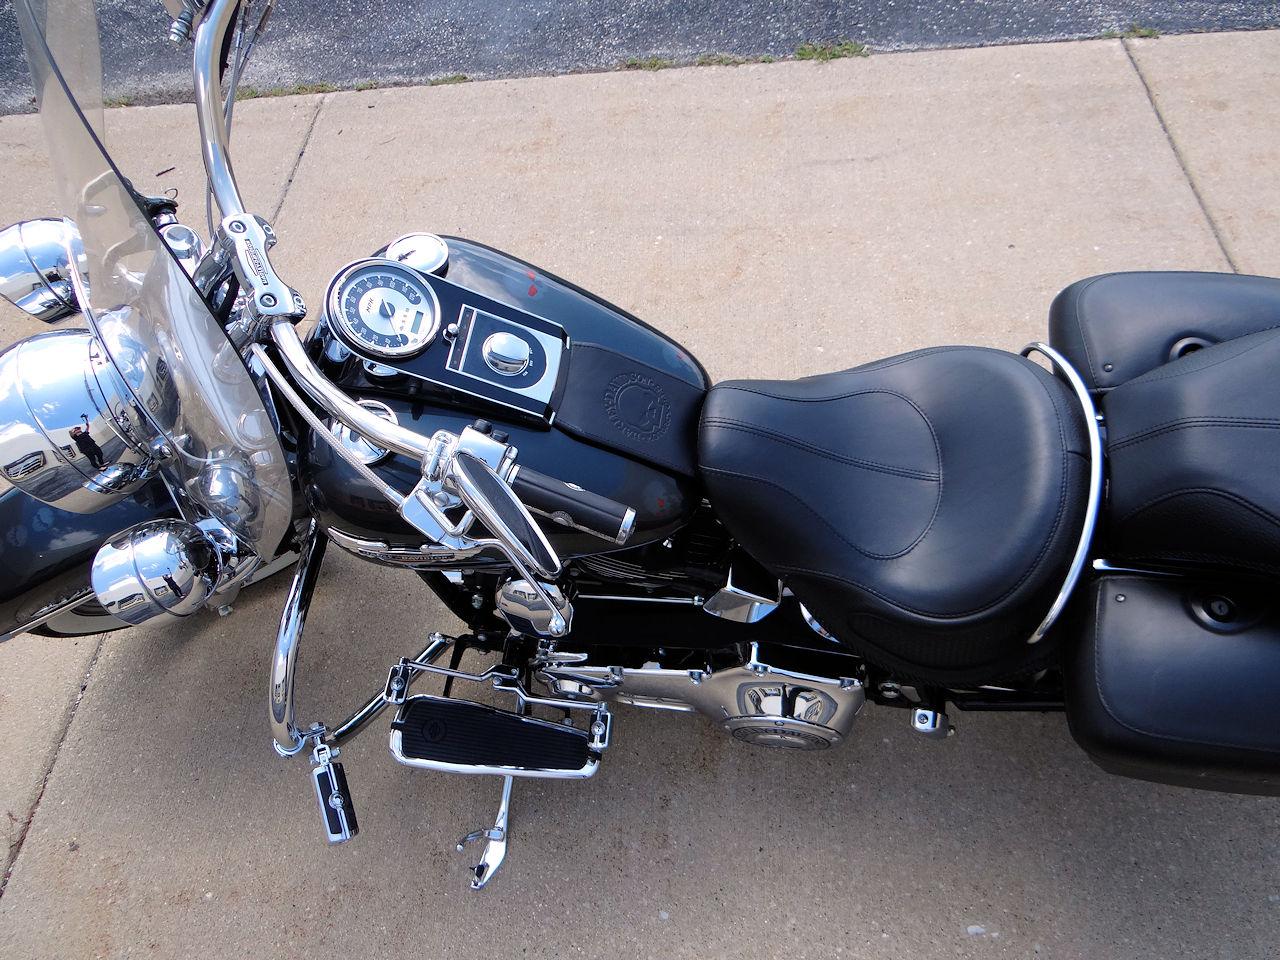 2006 Harley Davidson FLSTNI 48